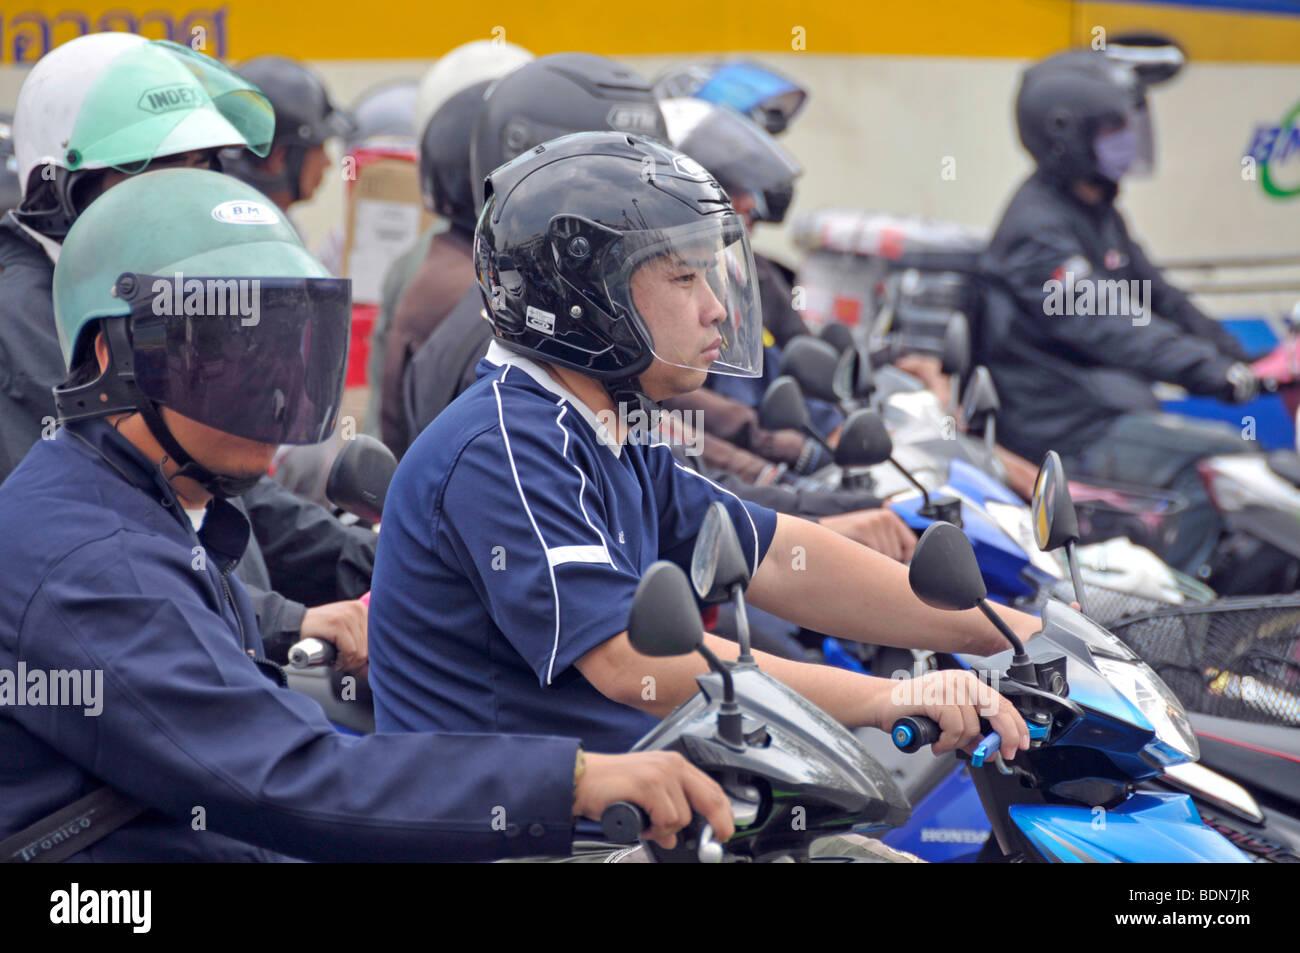 Motorbikers and moped riders in traffic chaos, Ratchamnoen Klang Road, Bangkok, Thailand, Asia - Stock Image